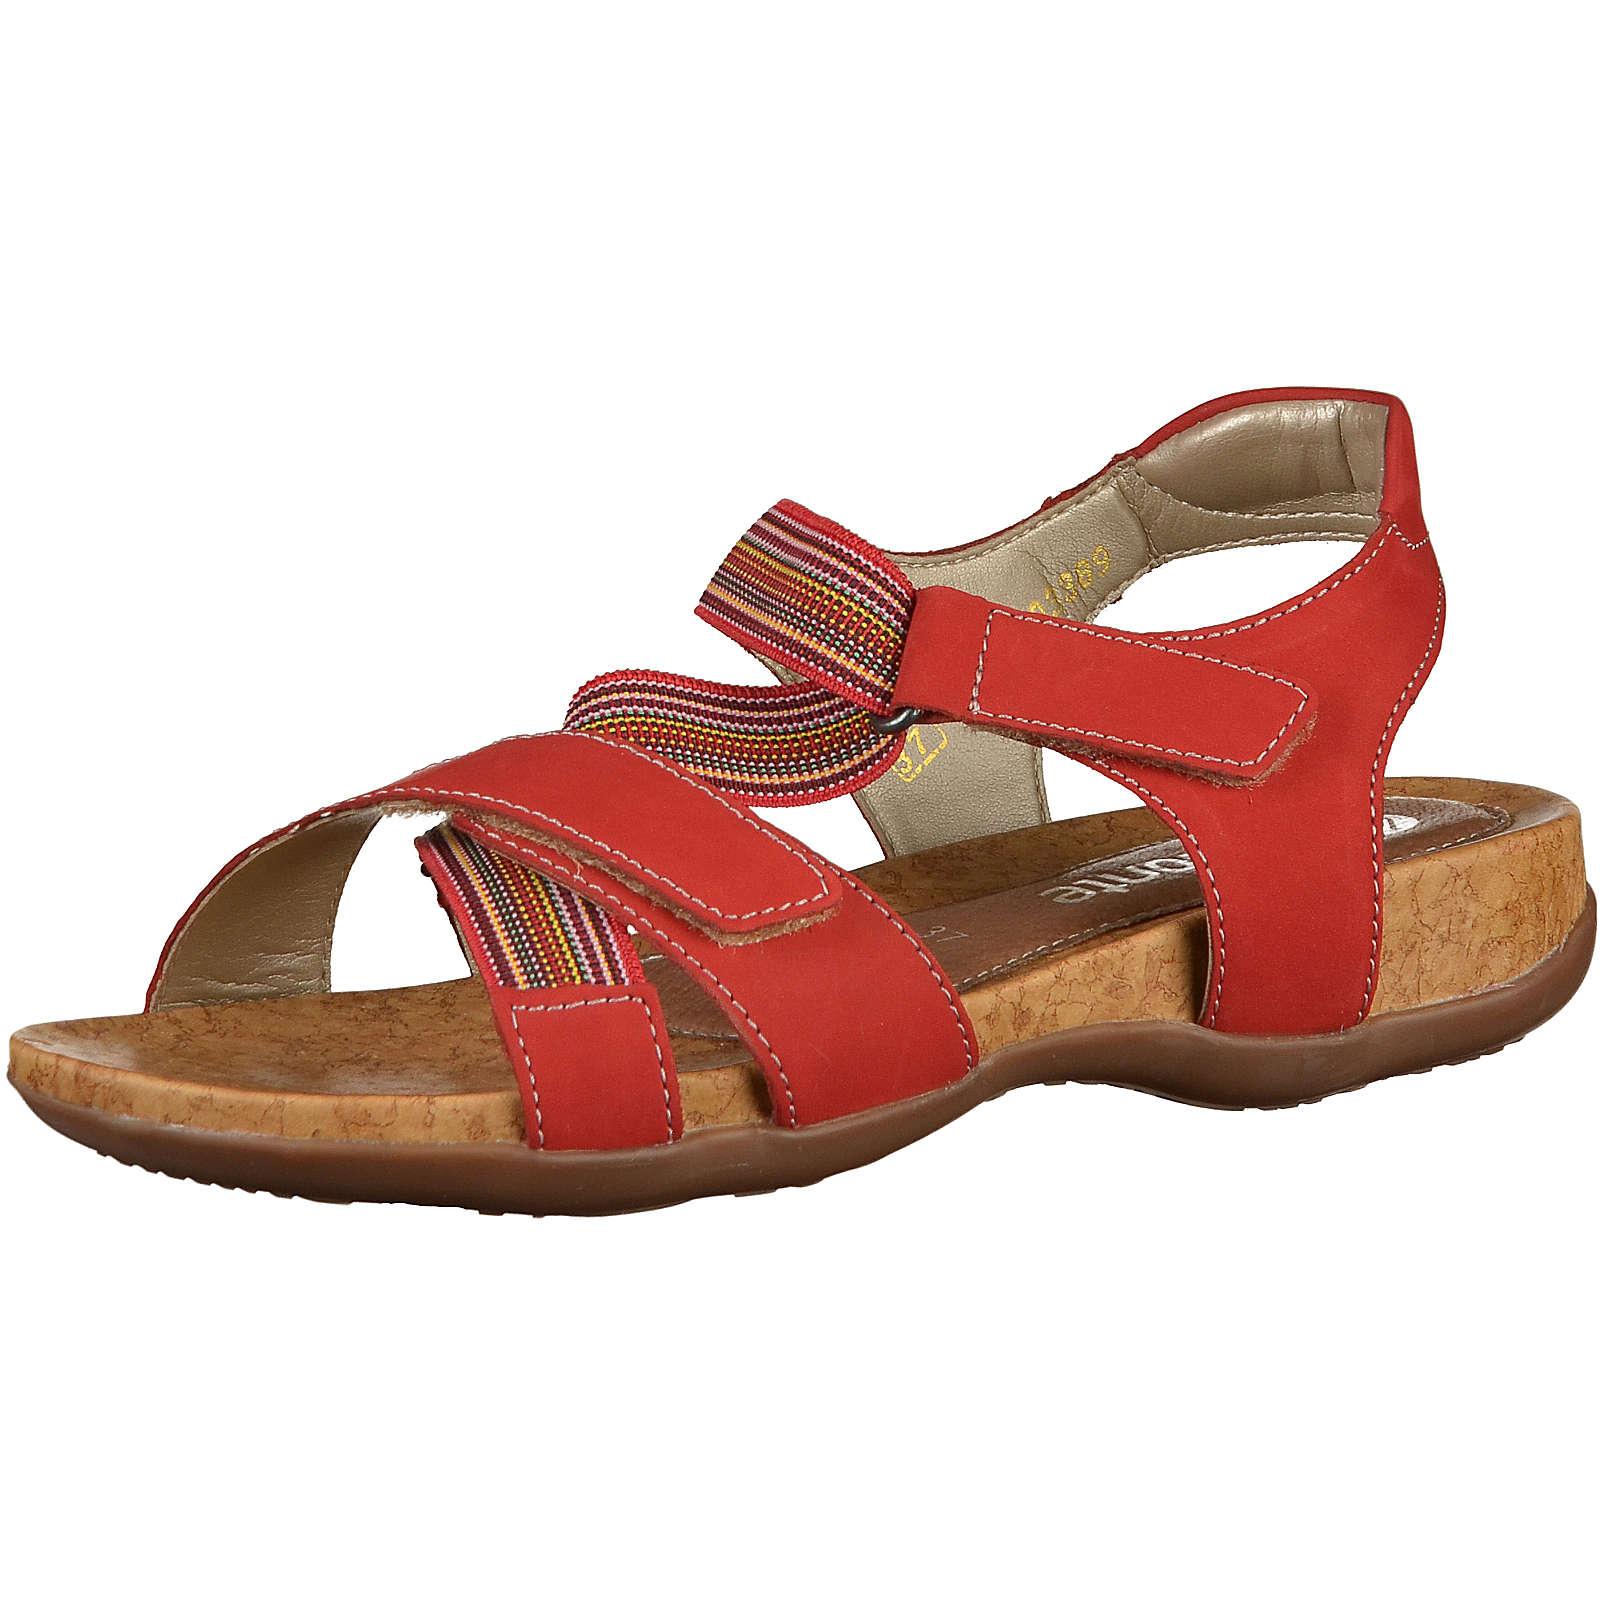 remonte Klassische Sandalen rot Damen Gr. 36